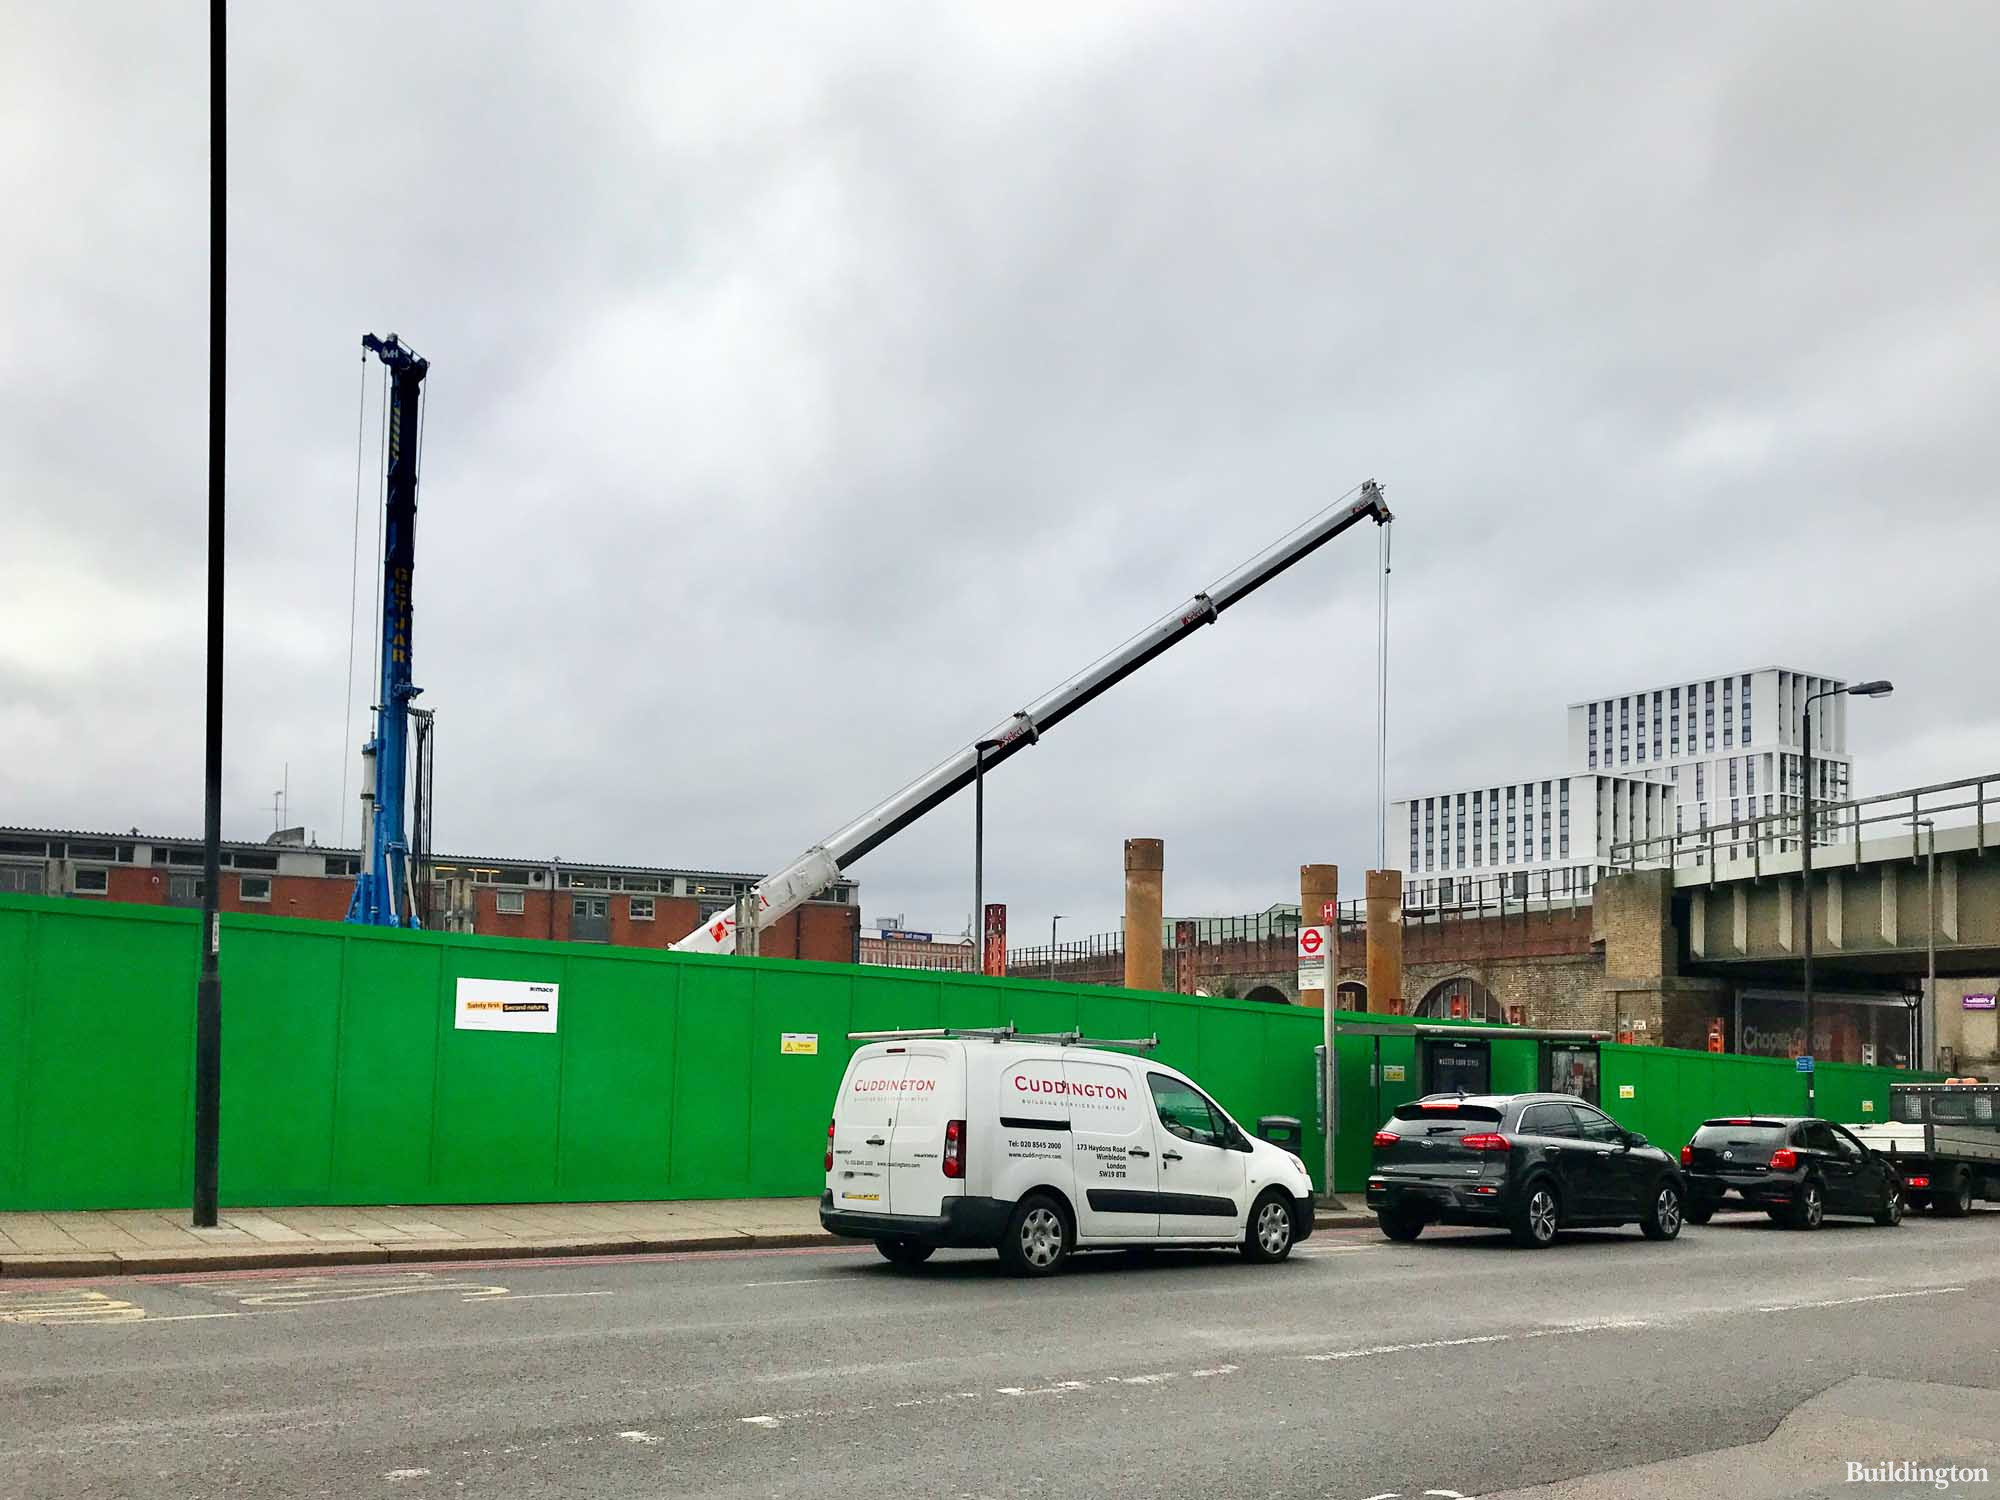 Mace on site of Urbanest's Palmerston Court development in autumn 2021.